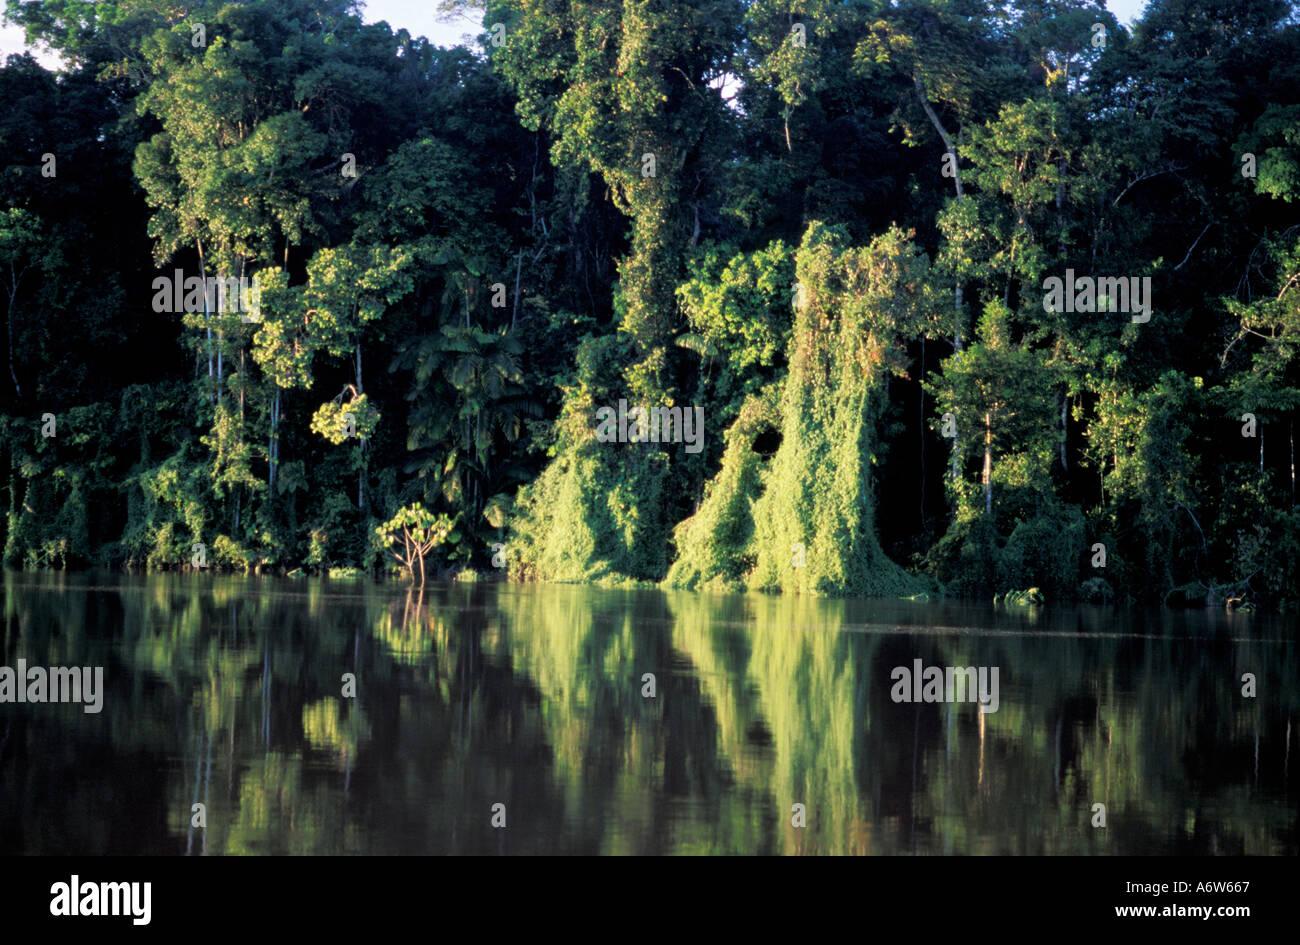 Amazon rainforest Brazil Preserved river margin APP Áea de Preservação Permanente Permanent preservation area Stock Photo